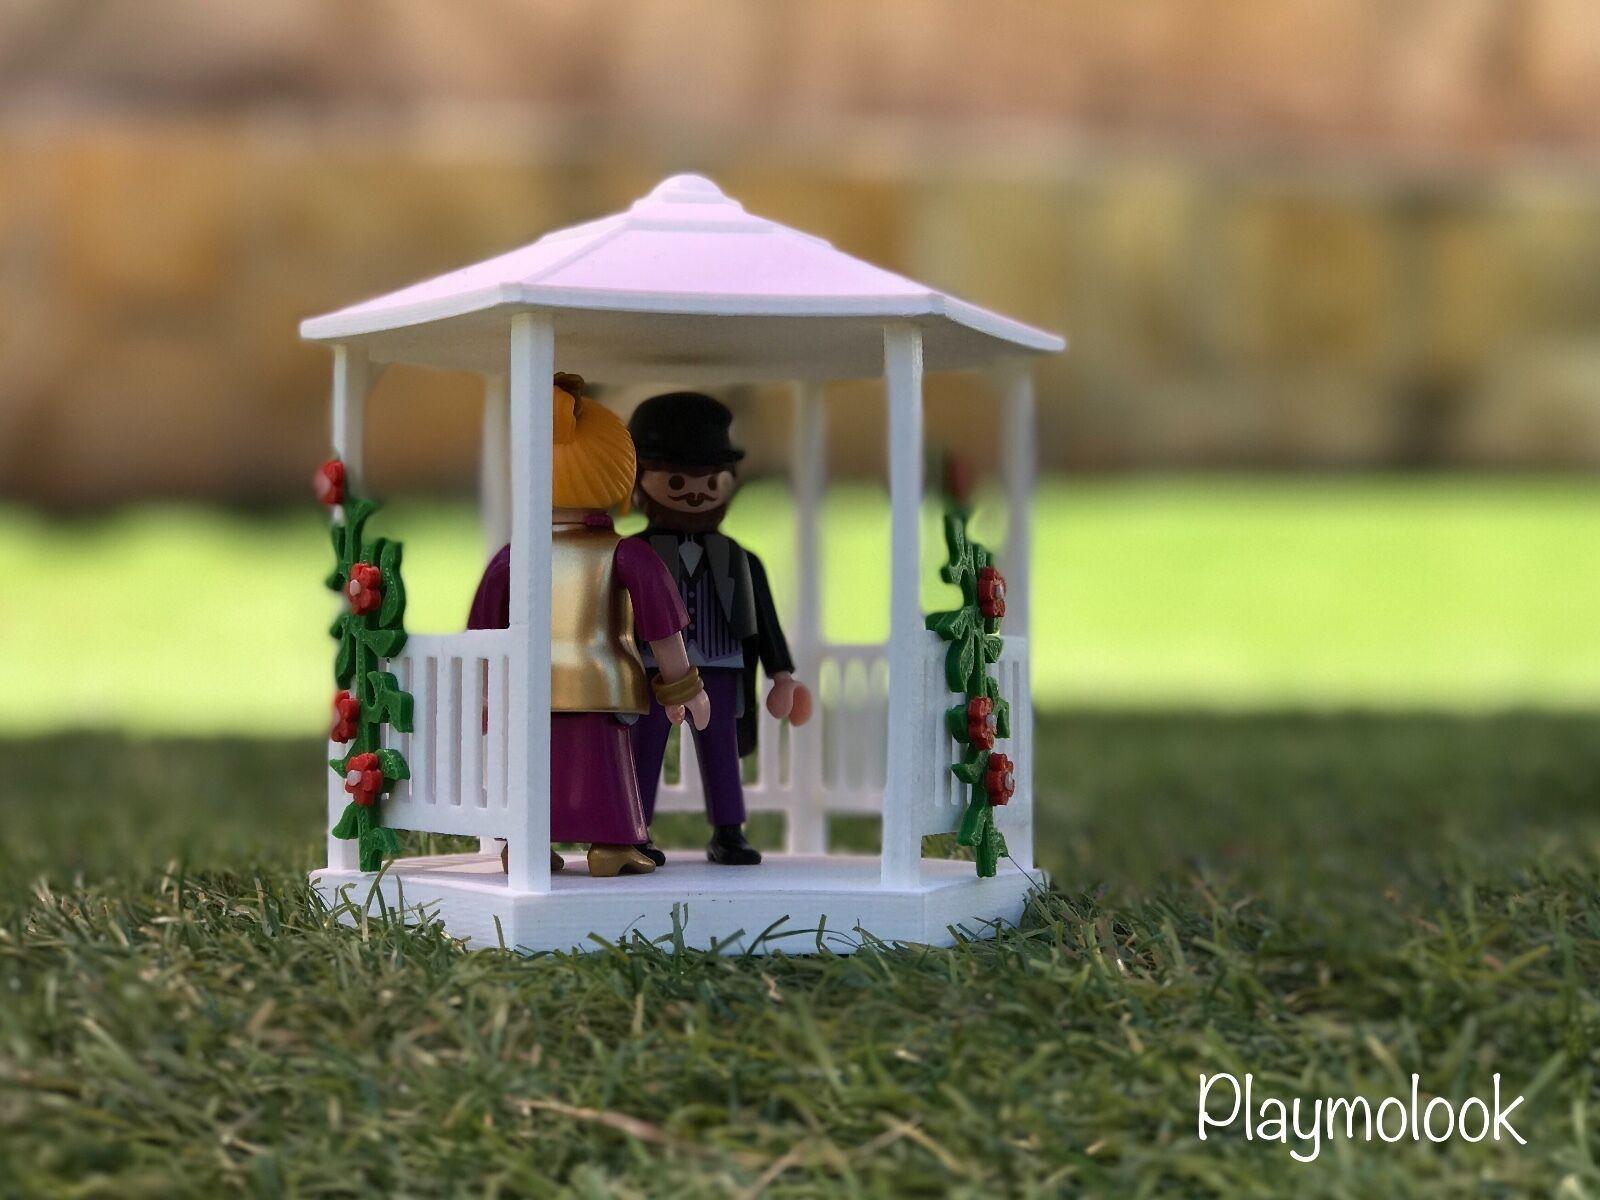 PERGOLA GAZÉBO MARIAGE VICTORIEN TONNELLE MINIATURE FIGURINES PLAYMOBIL AUCUNE